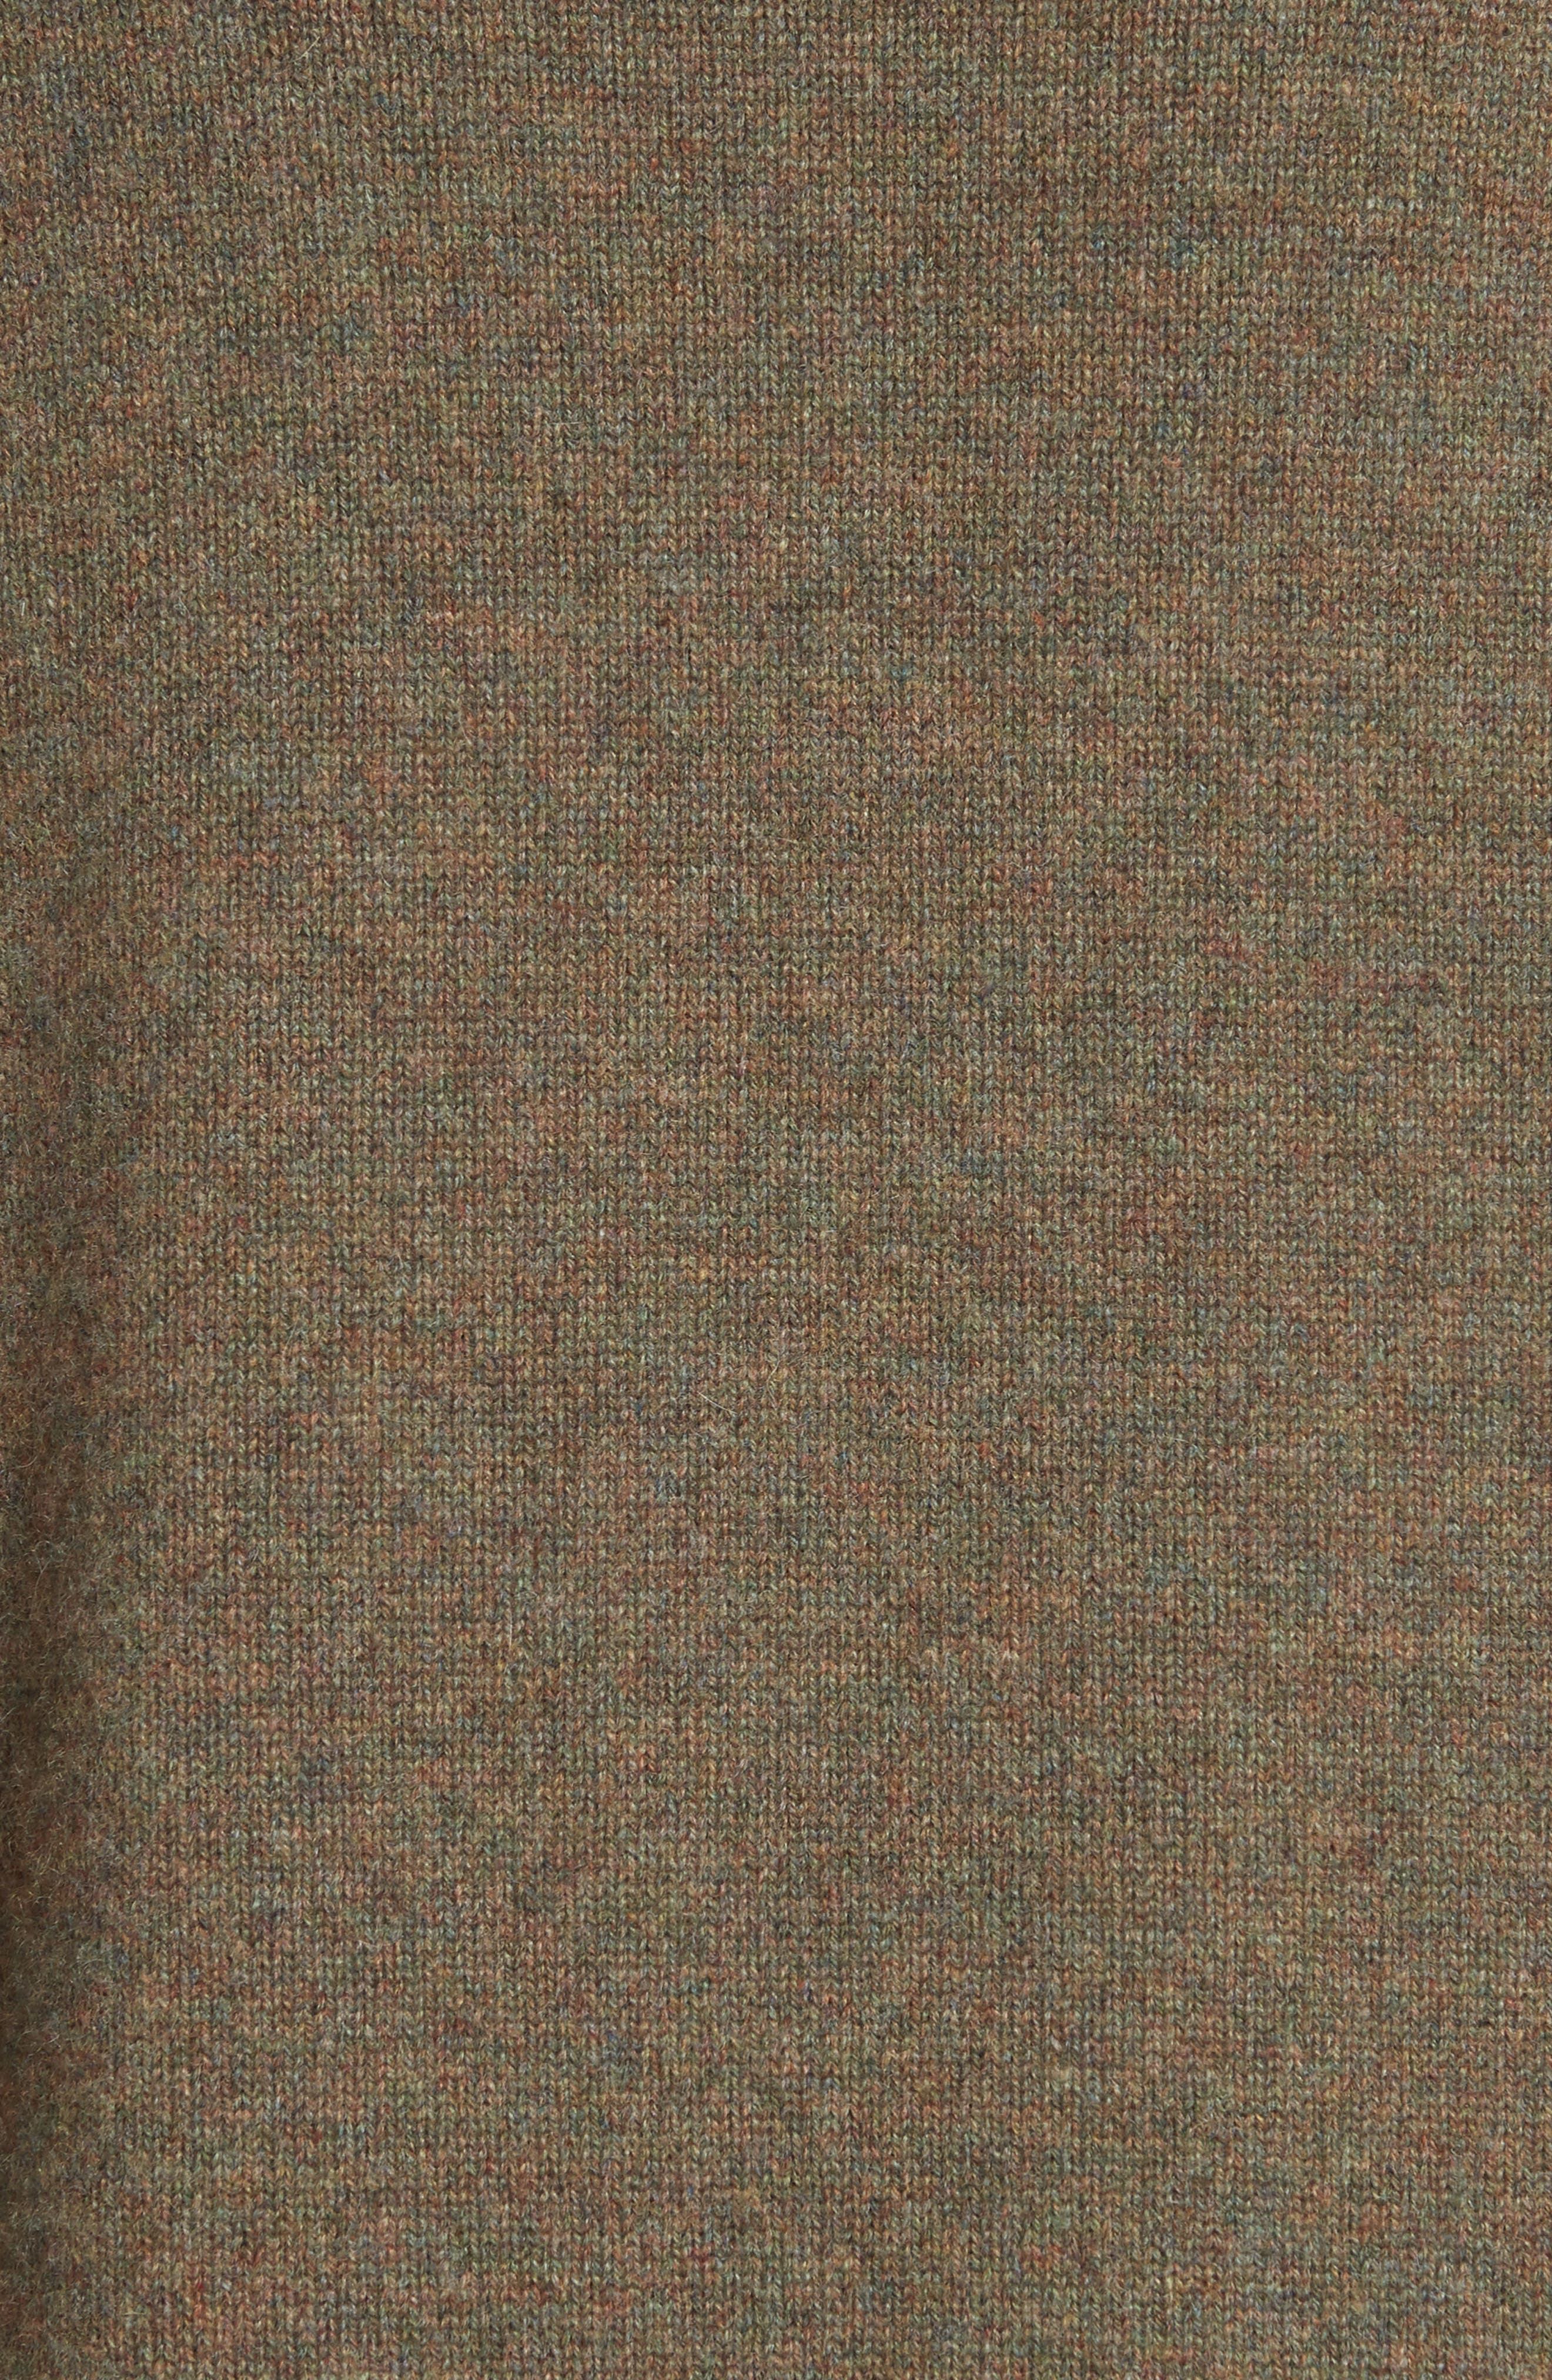 VICTORIA BECKHAM, Stretch Cashmere Turtleneck Sweater, Alternate thumbnail 6, color, OLIVE